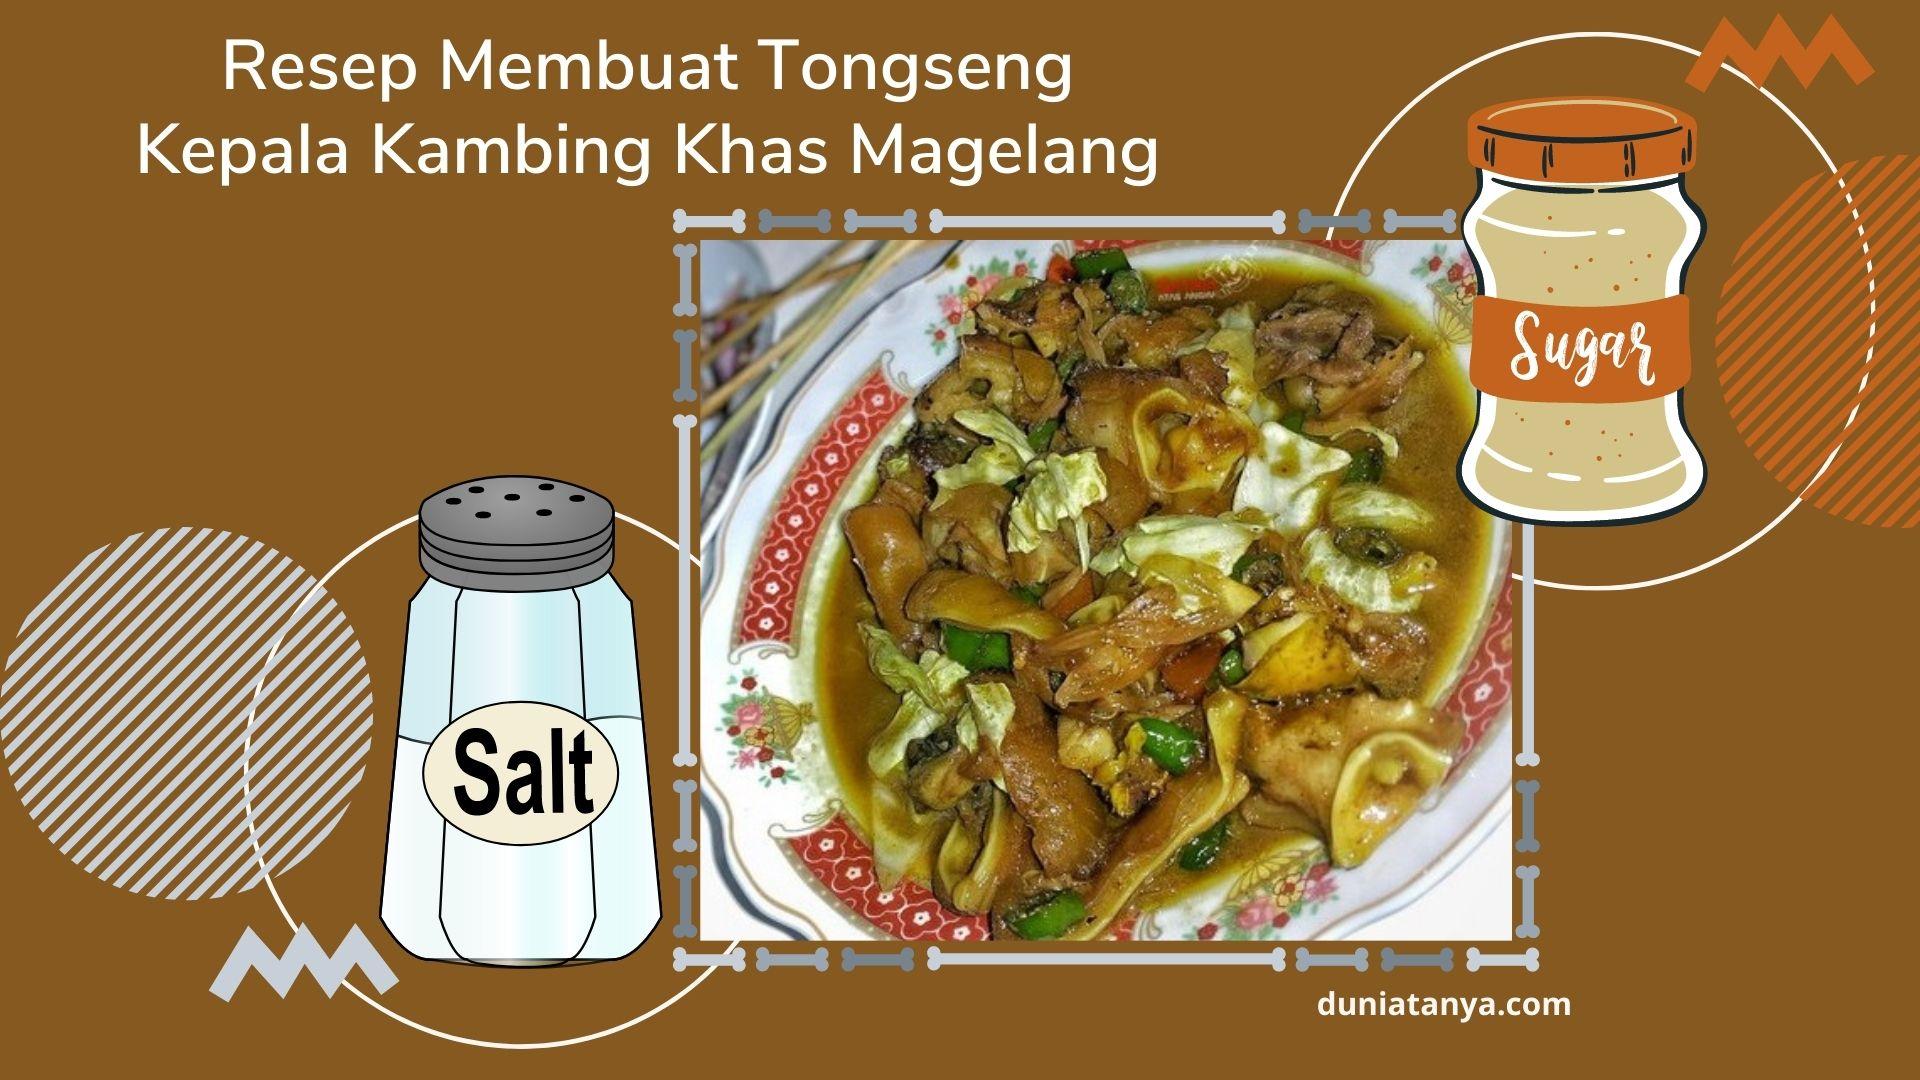 Read more about the article Resep Membuat Tongseng Kepala Kambing Khas Mag322elang